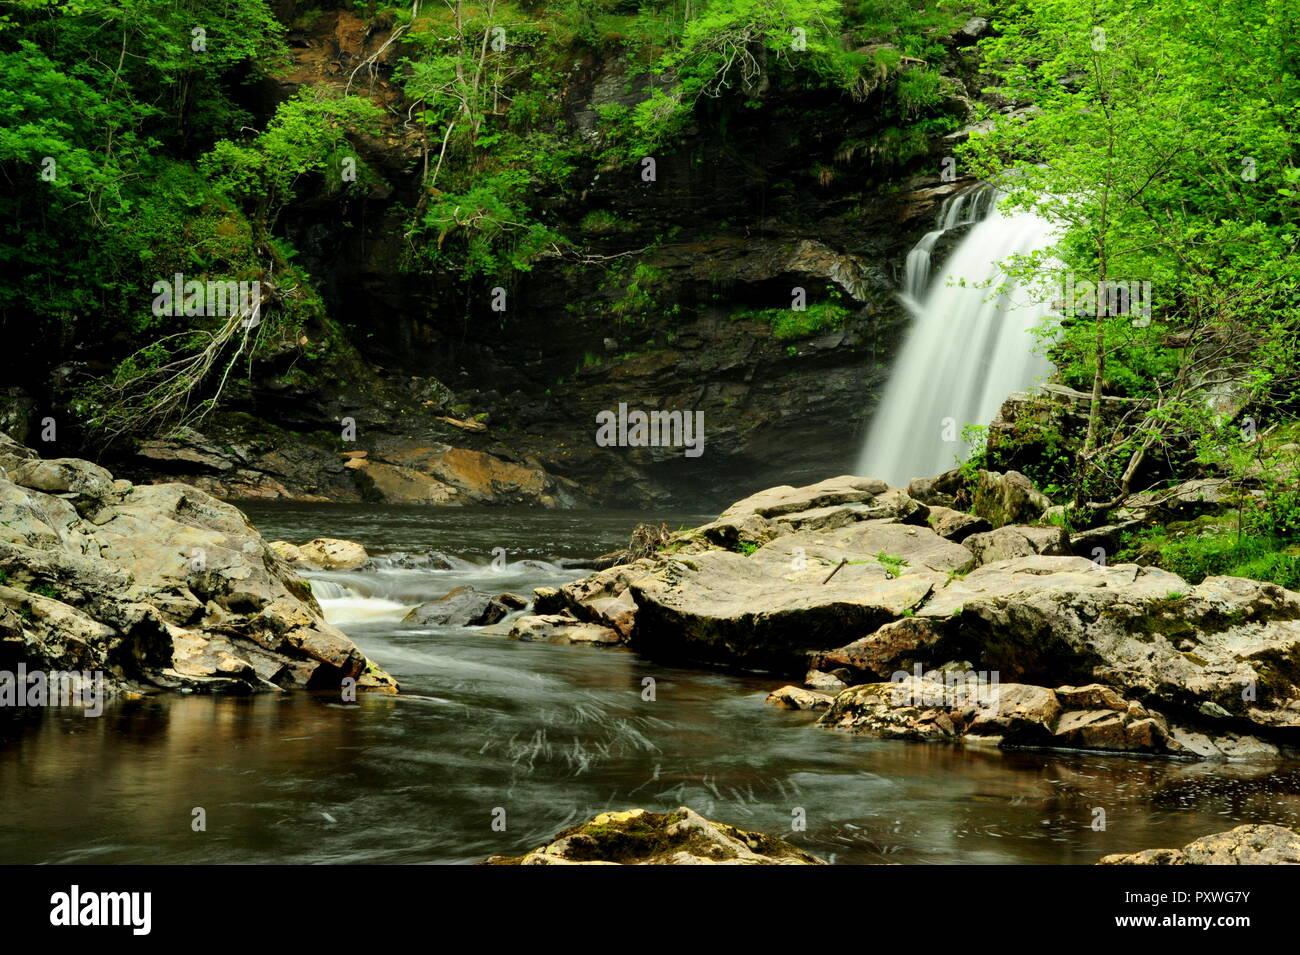 Falls of Falloch, Schottland, Wasserfall - Stock Image